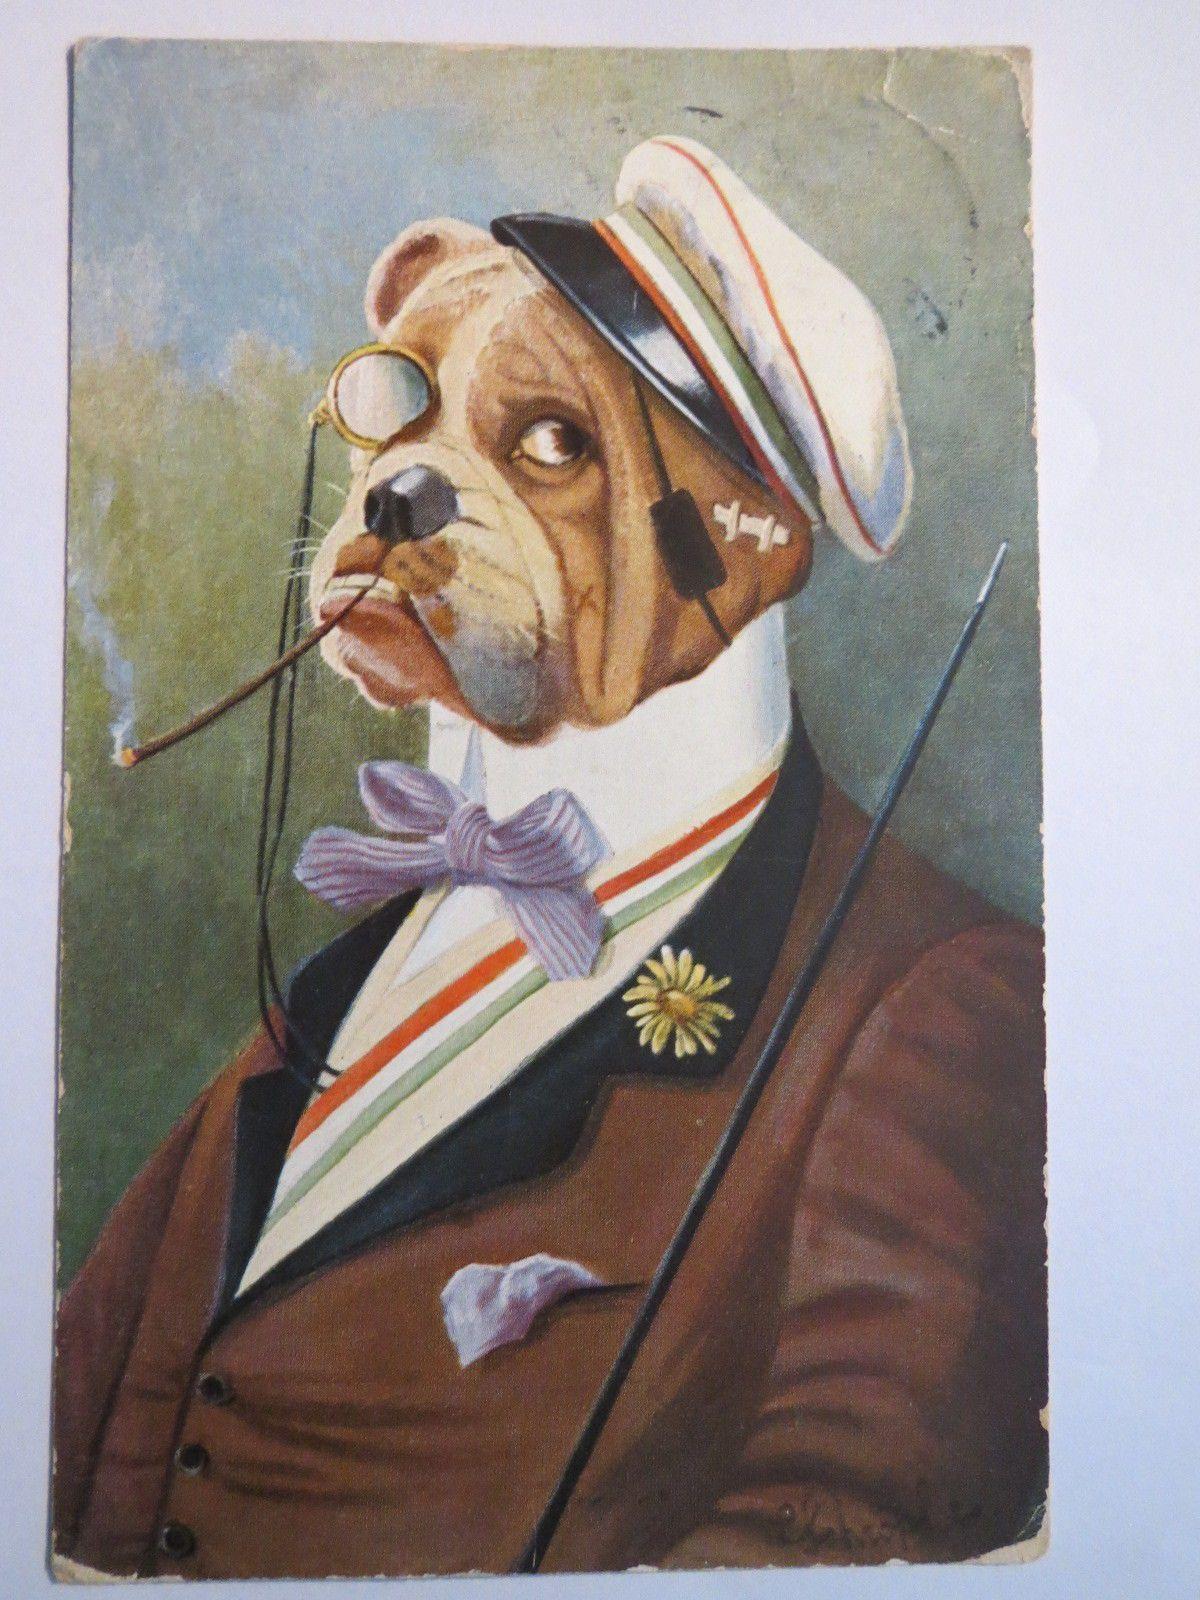 Karikatur Hund Mensur Humoristische Hunde Bulldogge ALS Studiosus ...